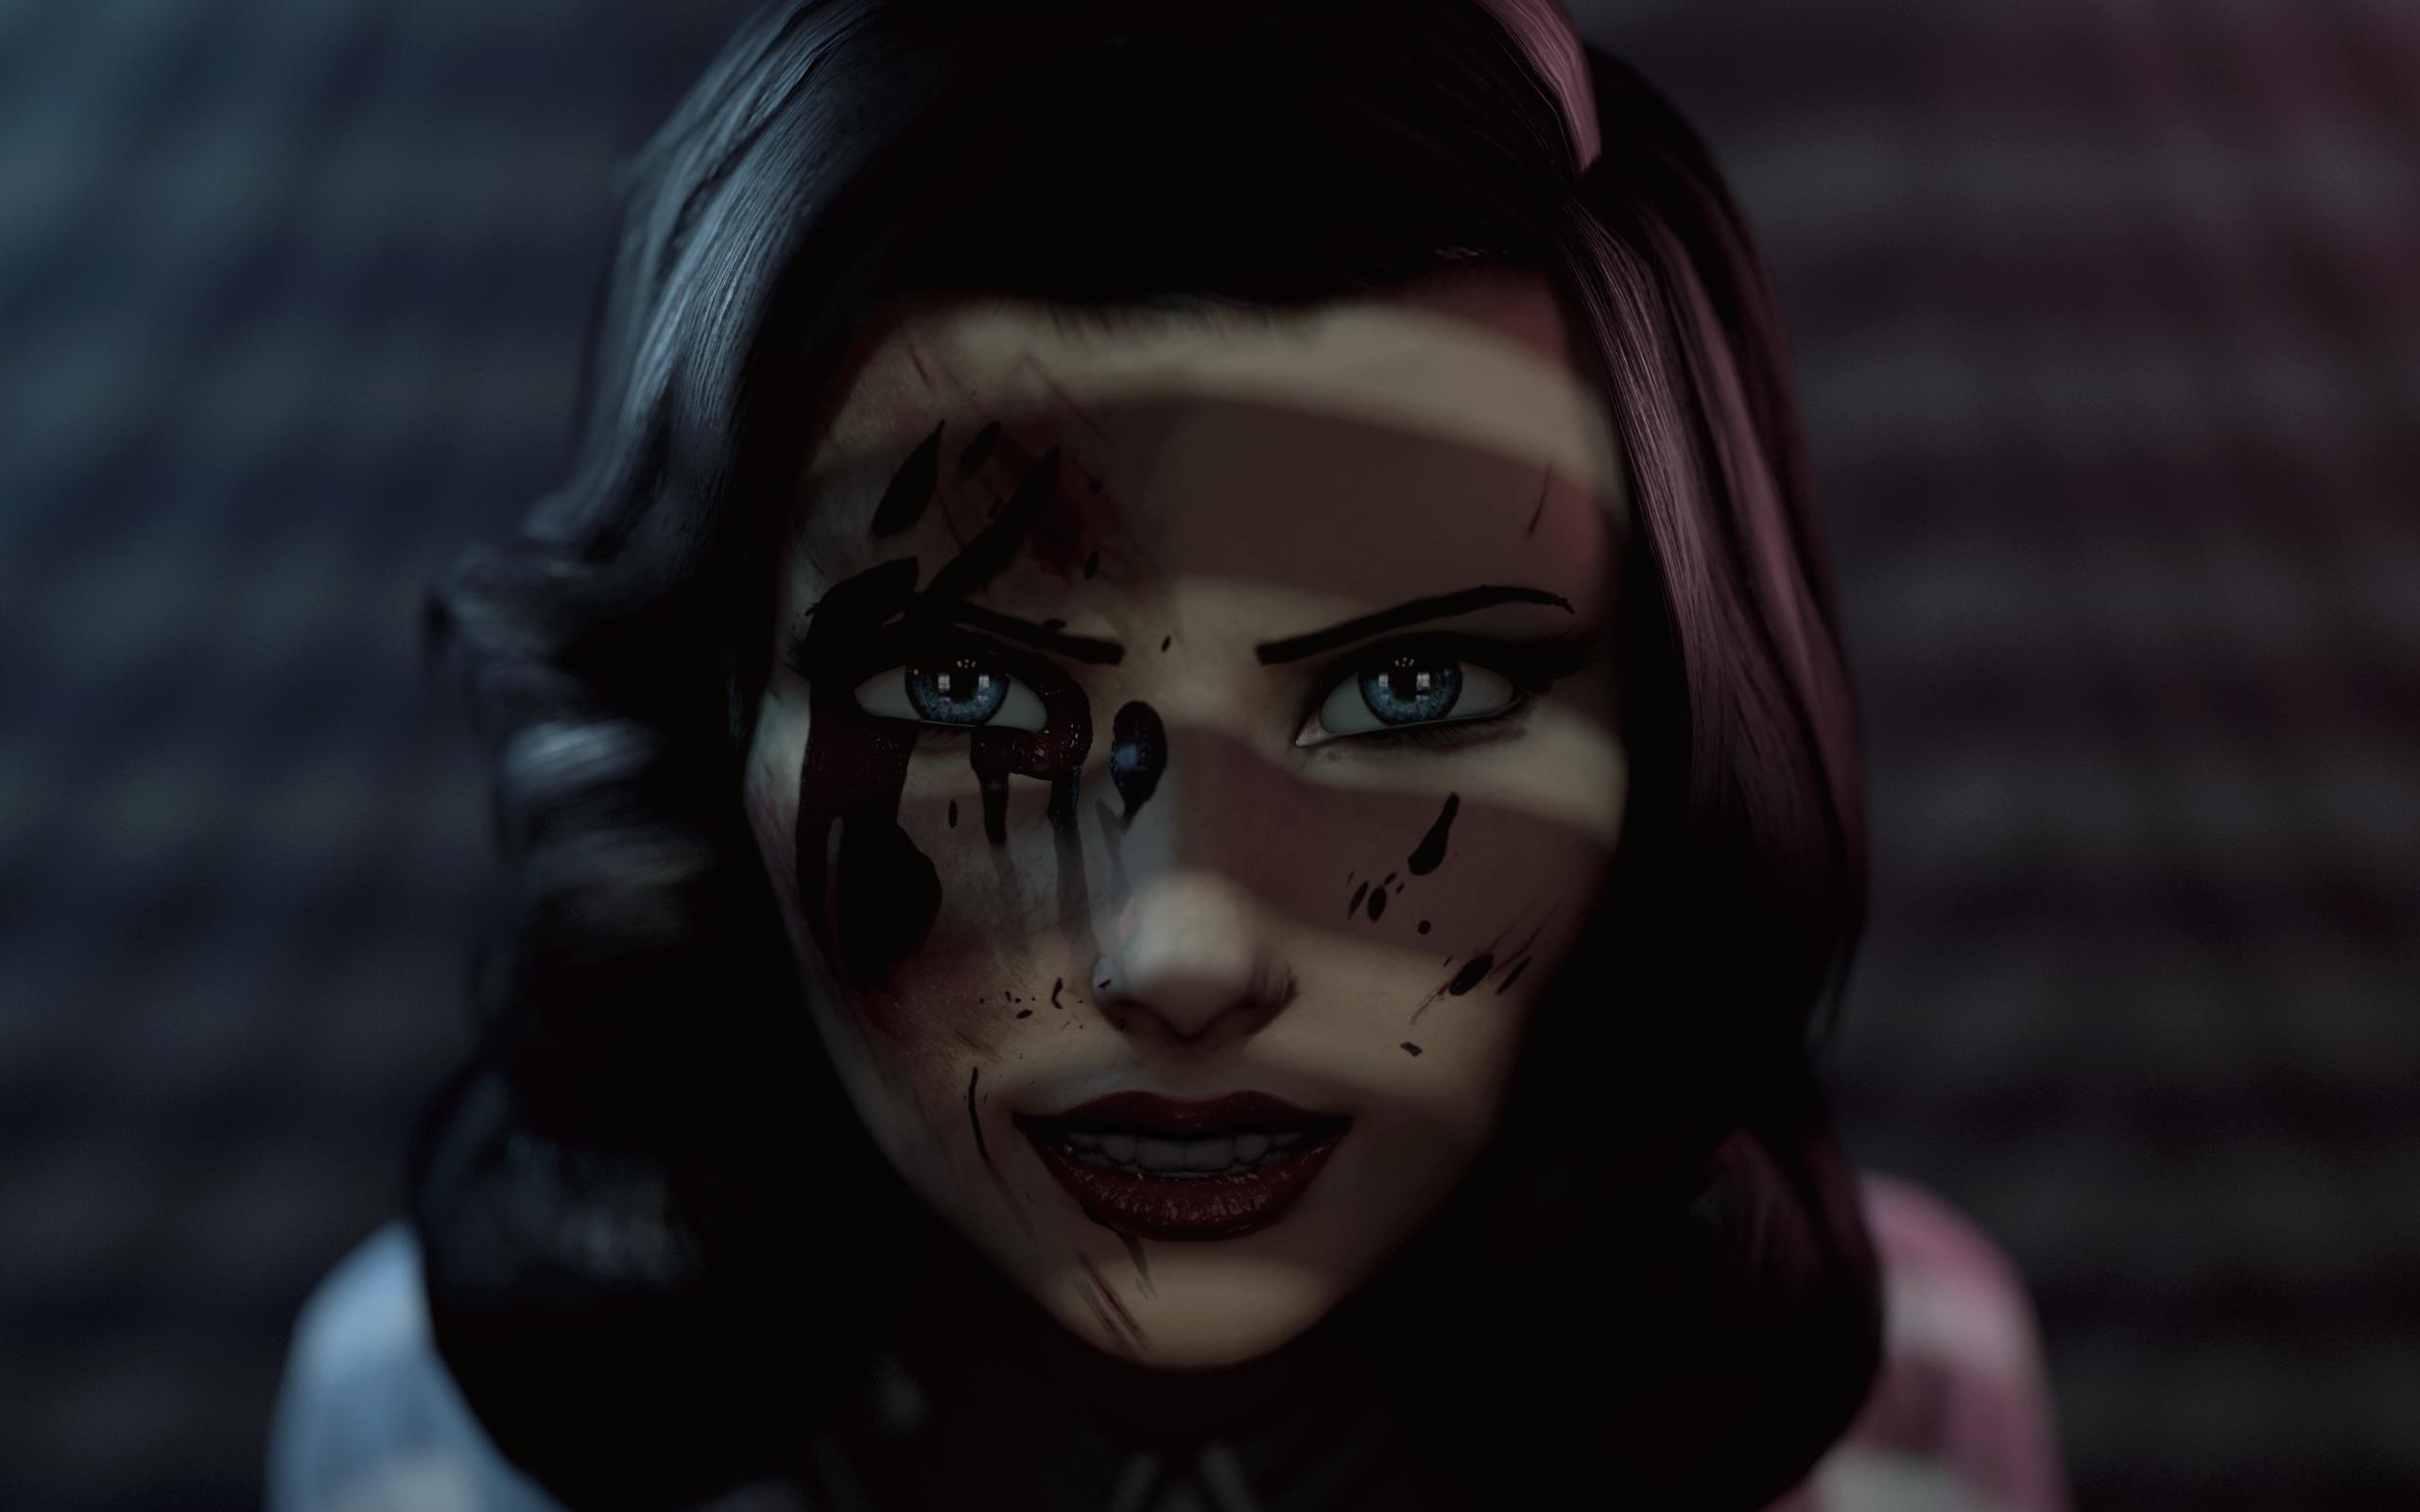 Killer Instinct - Elizabeth (Burial at Sea) by Ananina23.deviantart.com on @deviantART